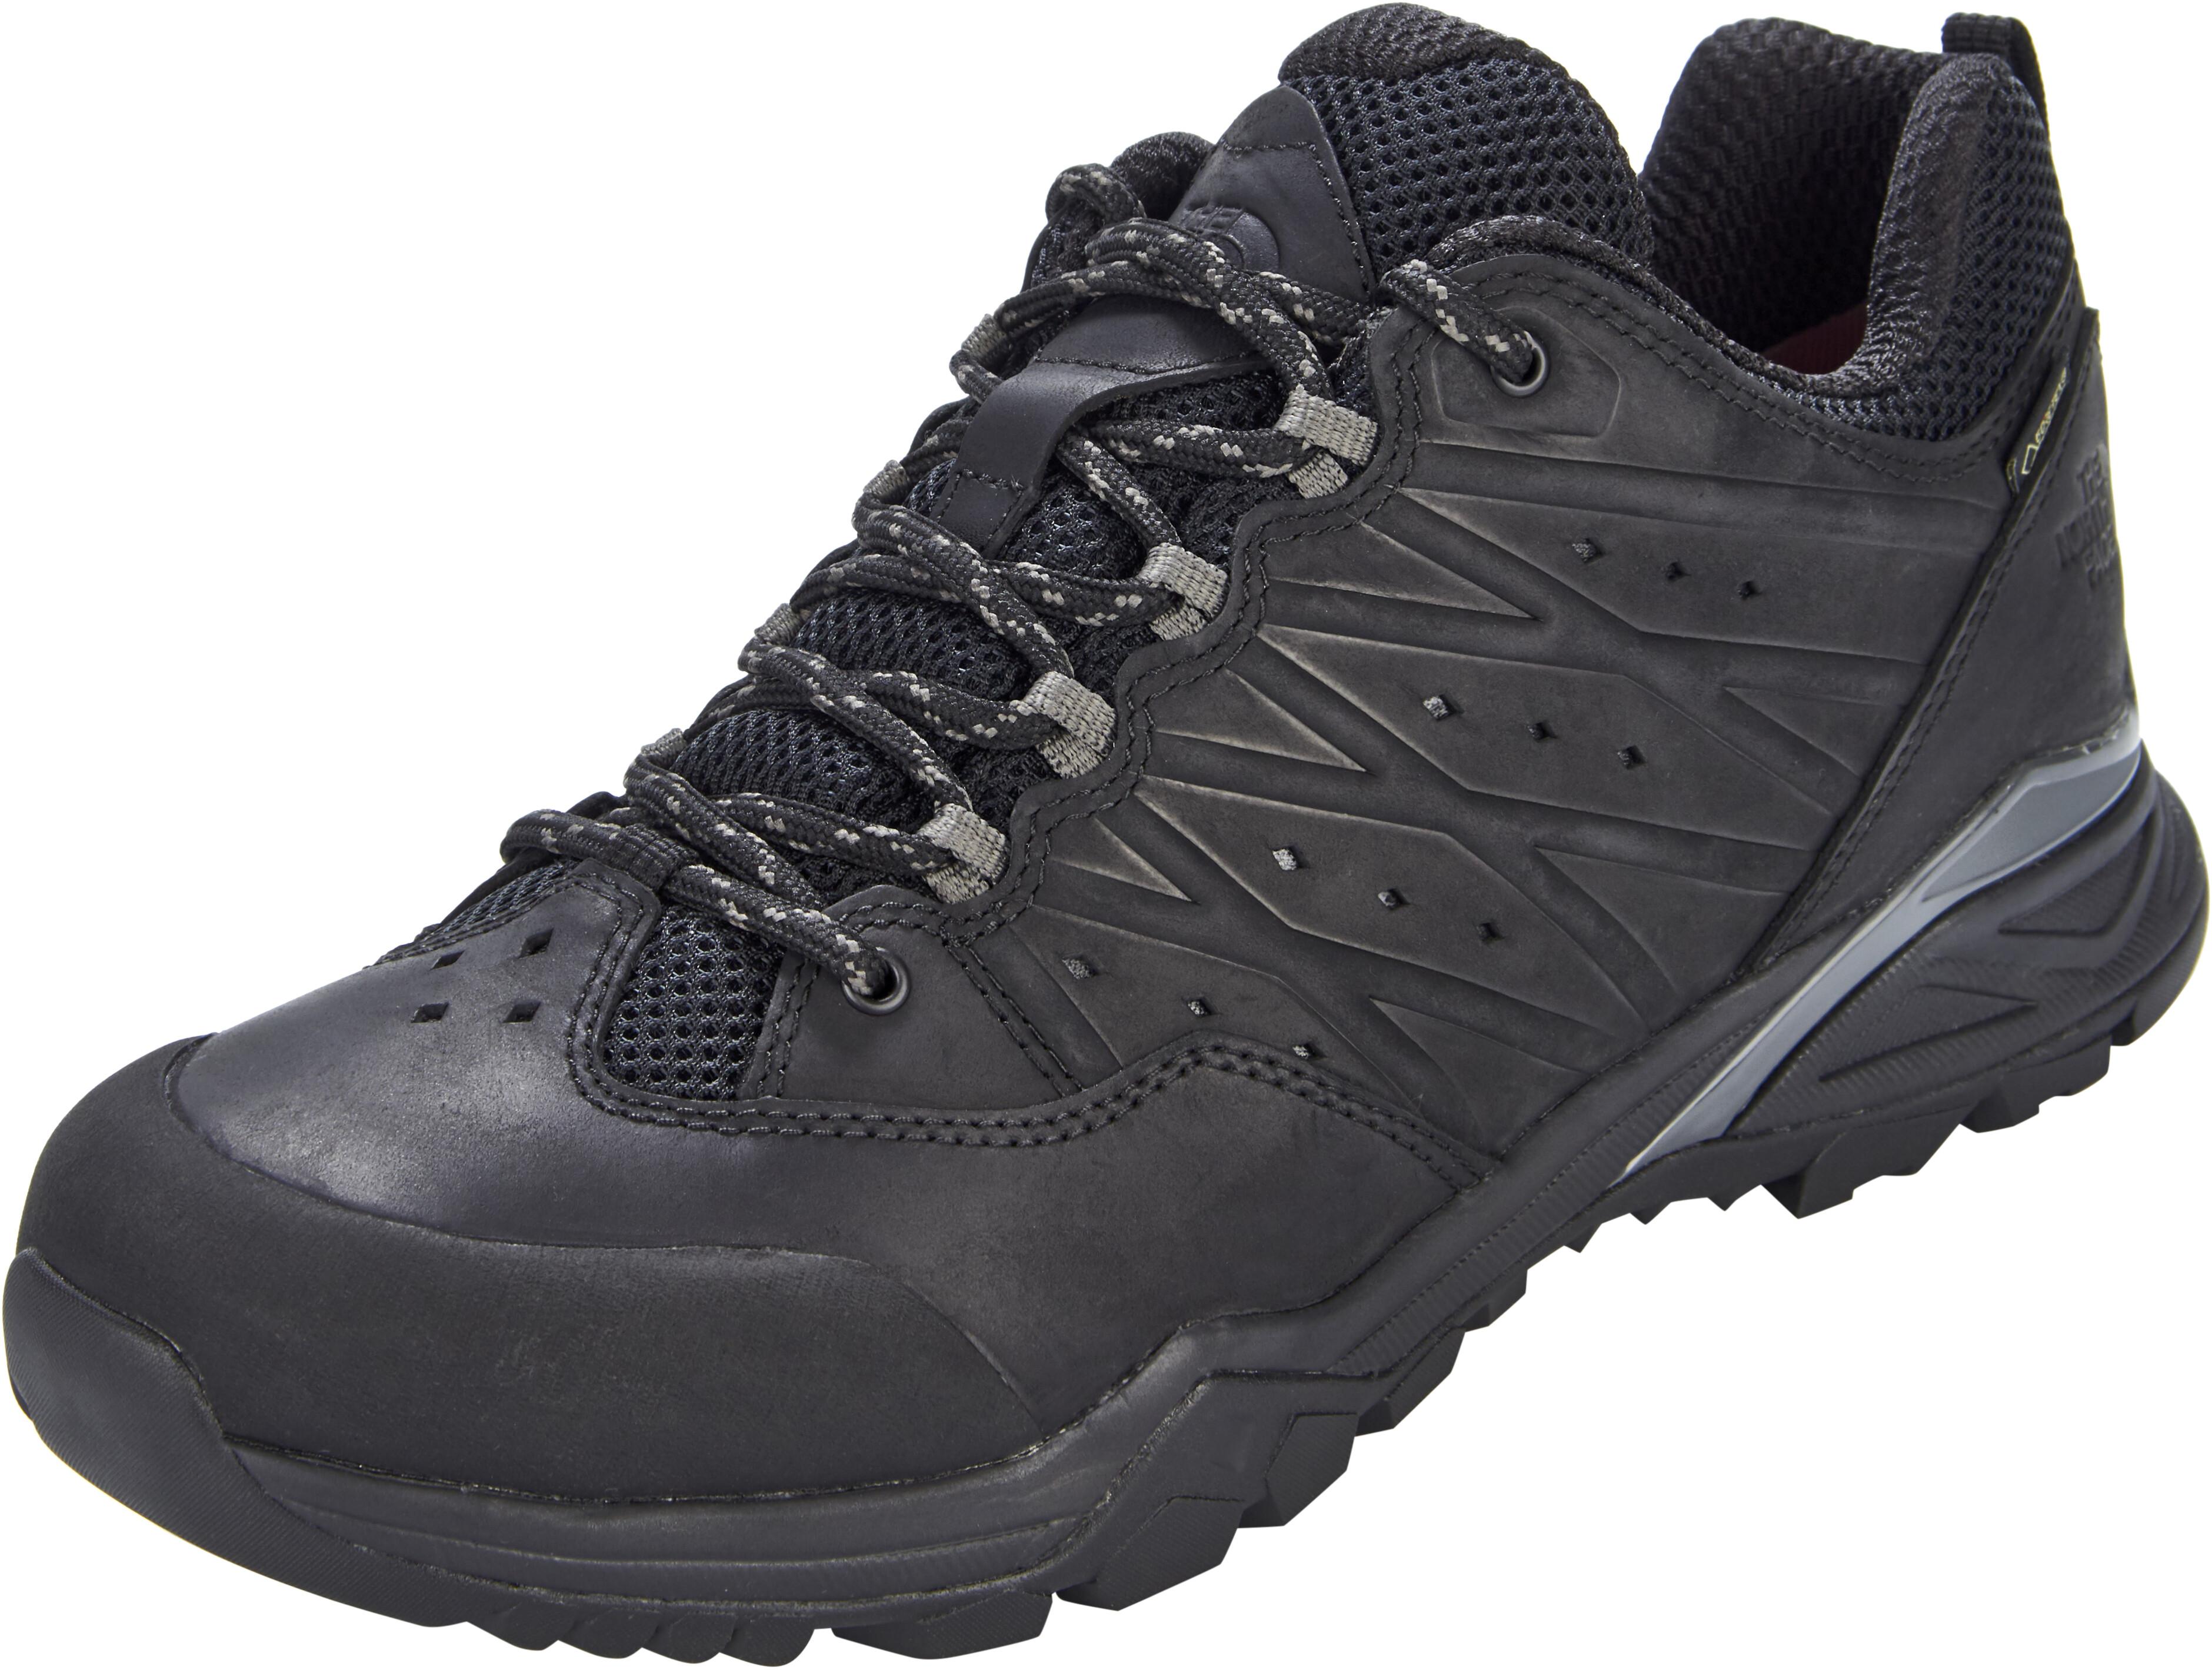 b809a17dd32 The North Face Hedgehog Hike II GTX Schoenen Heren, tnf black/graphite grey